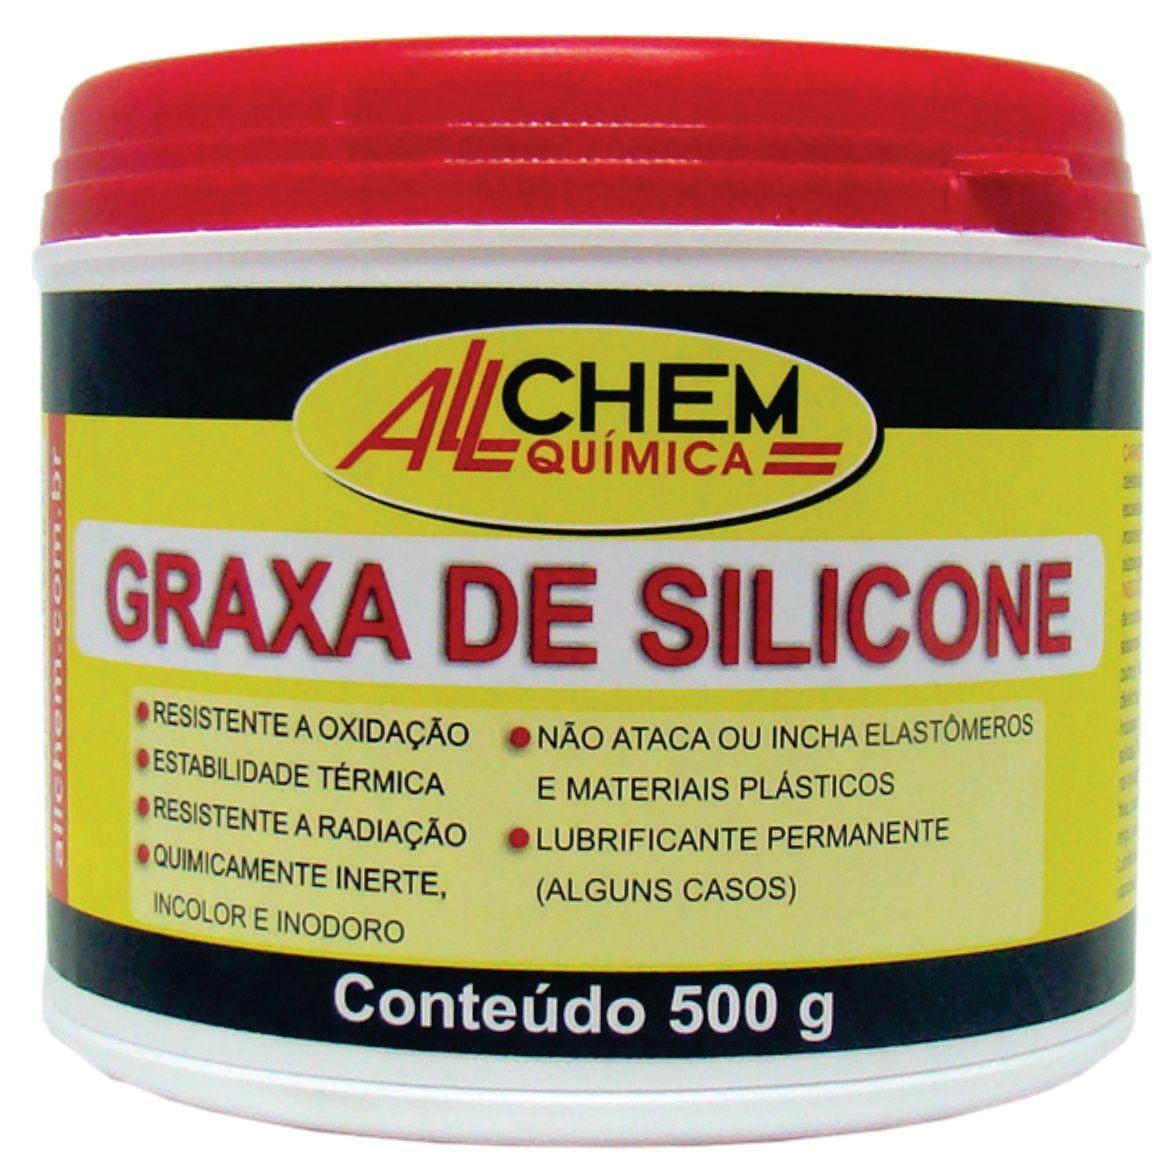 graxa-de-silicone-allchem